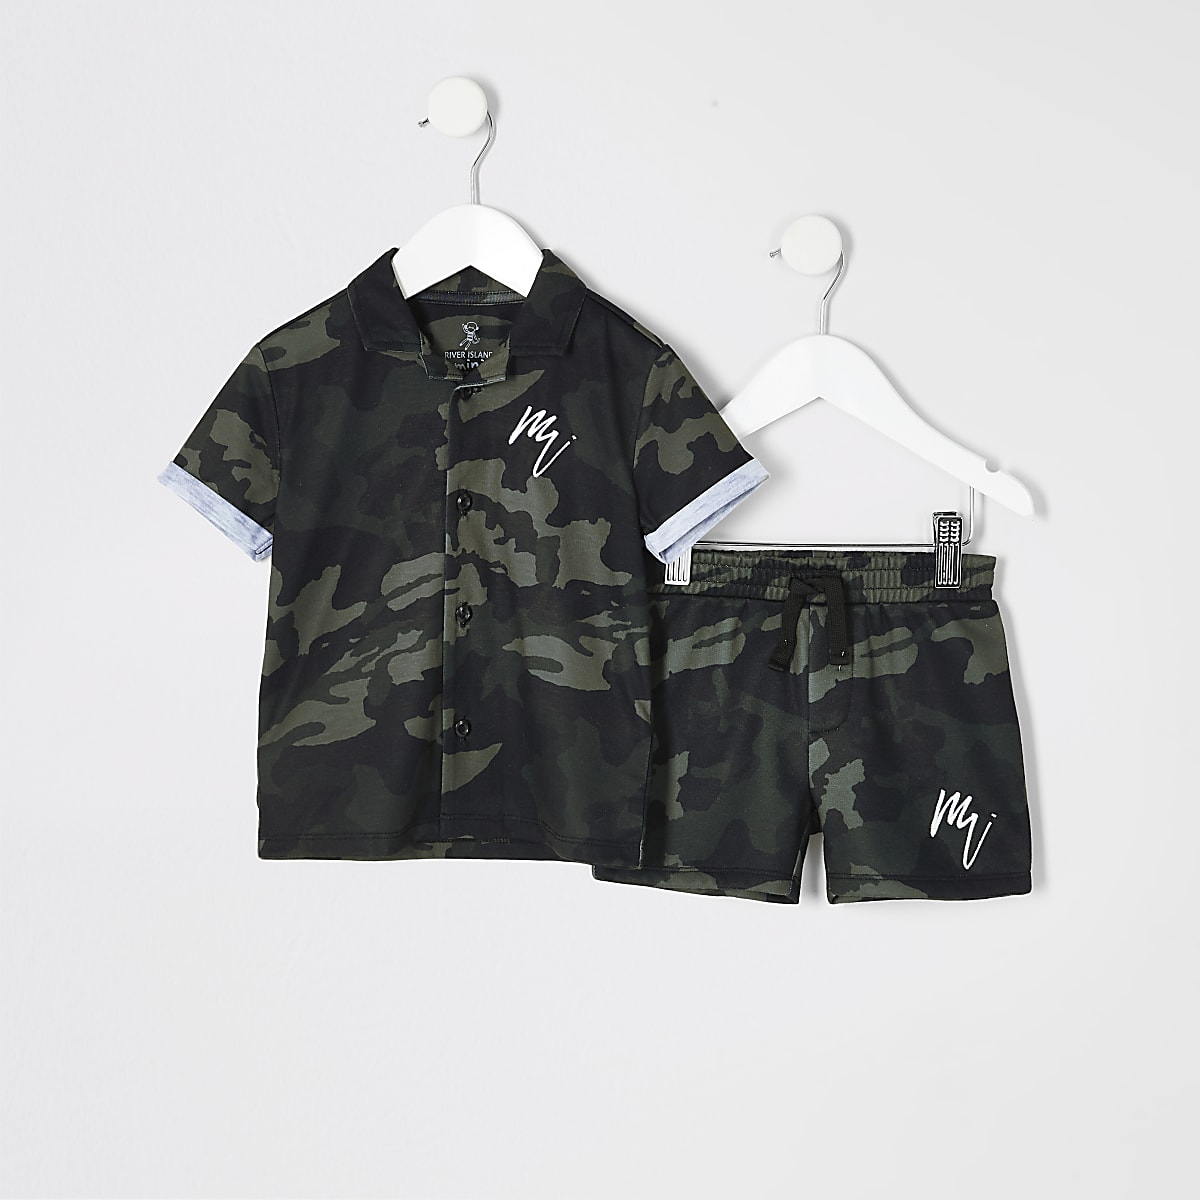 Mini boys khaki camo shirt outfit